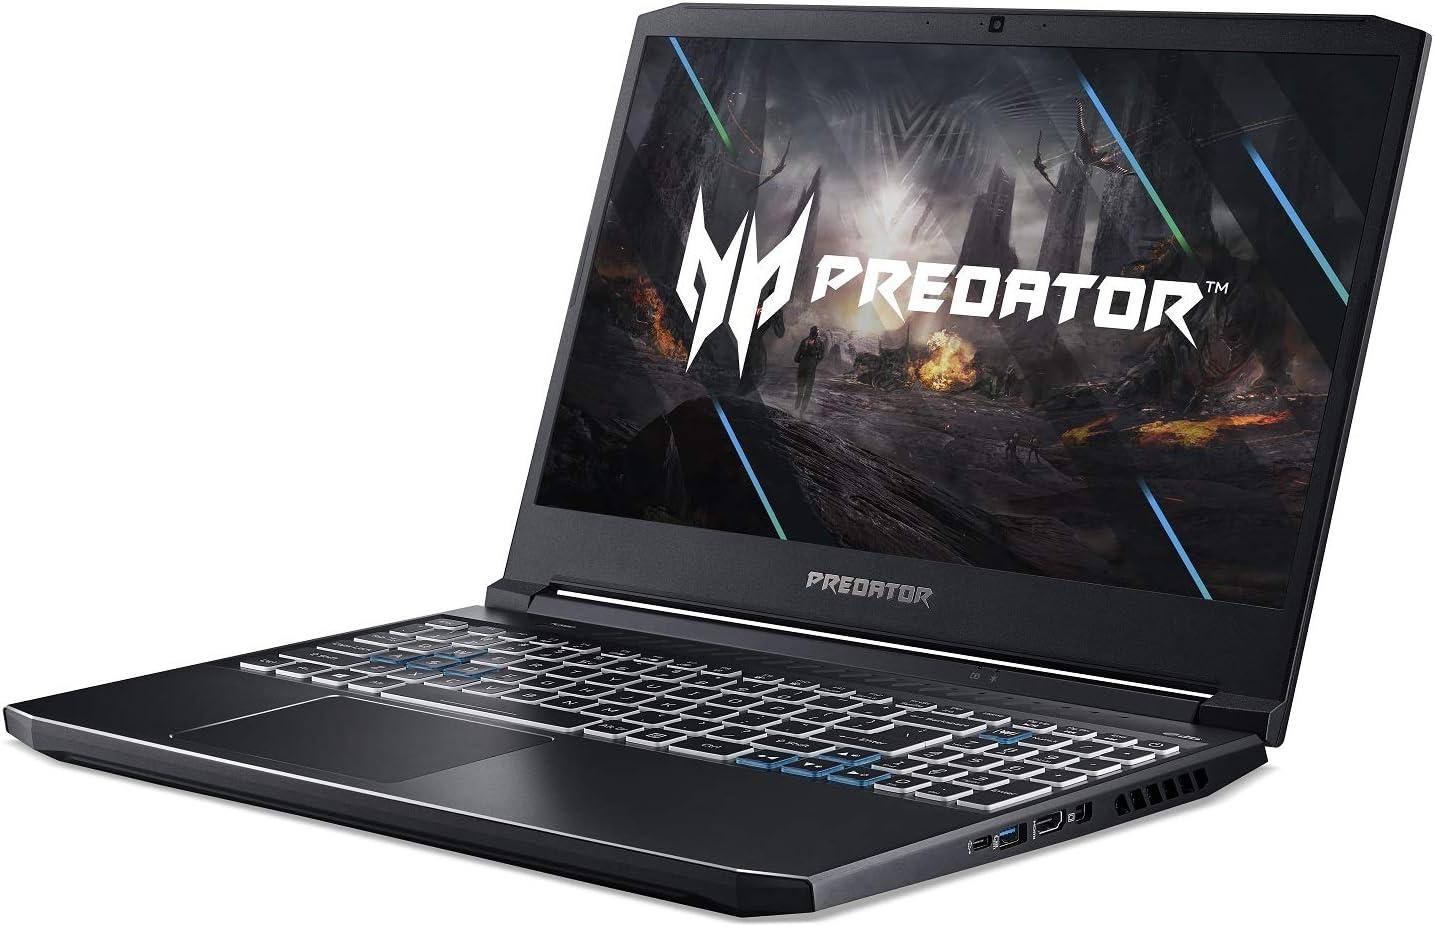 PH315-53-72XD Acer Predator Helios 300 Gaming Laptop 15.6 Full HD 144Hz 3ms IPS Display RGB Keyboard 512GB NVMe SSD Intel i7-10750H Wi-Fi 6 16GB Dual-Channel DDR4 NVIDIA GeForce RTX 2060 6GB